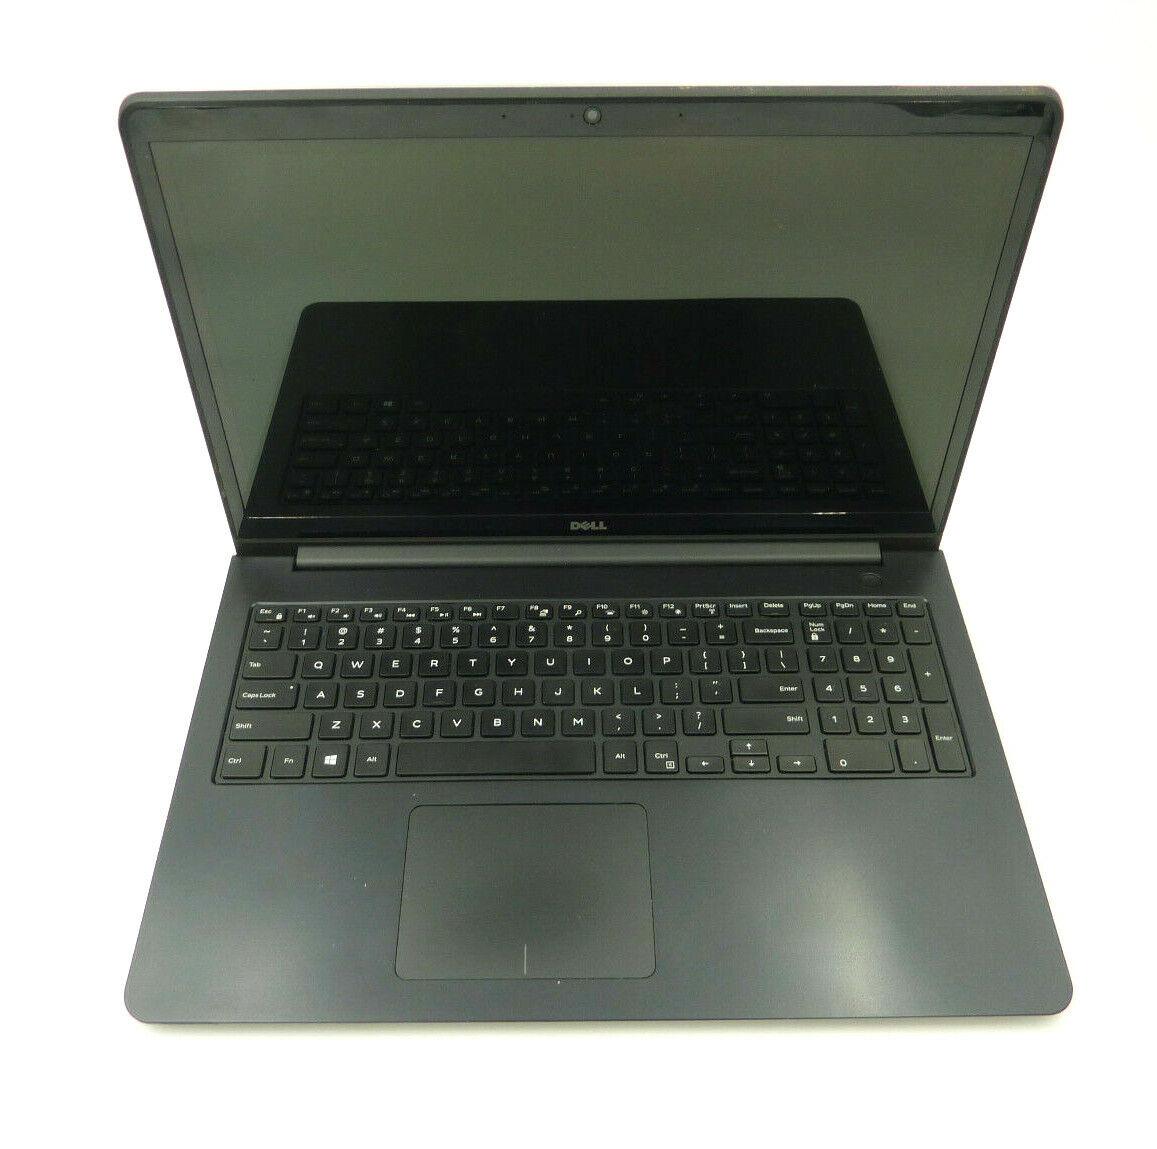 "Laptop Windows - DELL 5548 LAPTOP WINDOWS 10 i7-5500U 2.4GHz 8GB 750GB 15.6"" GRADE C 18096"